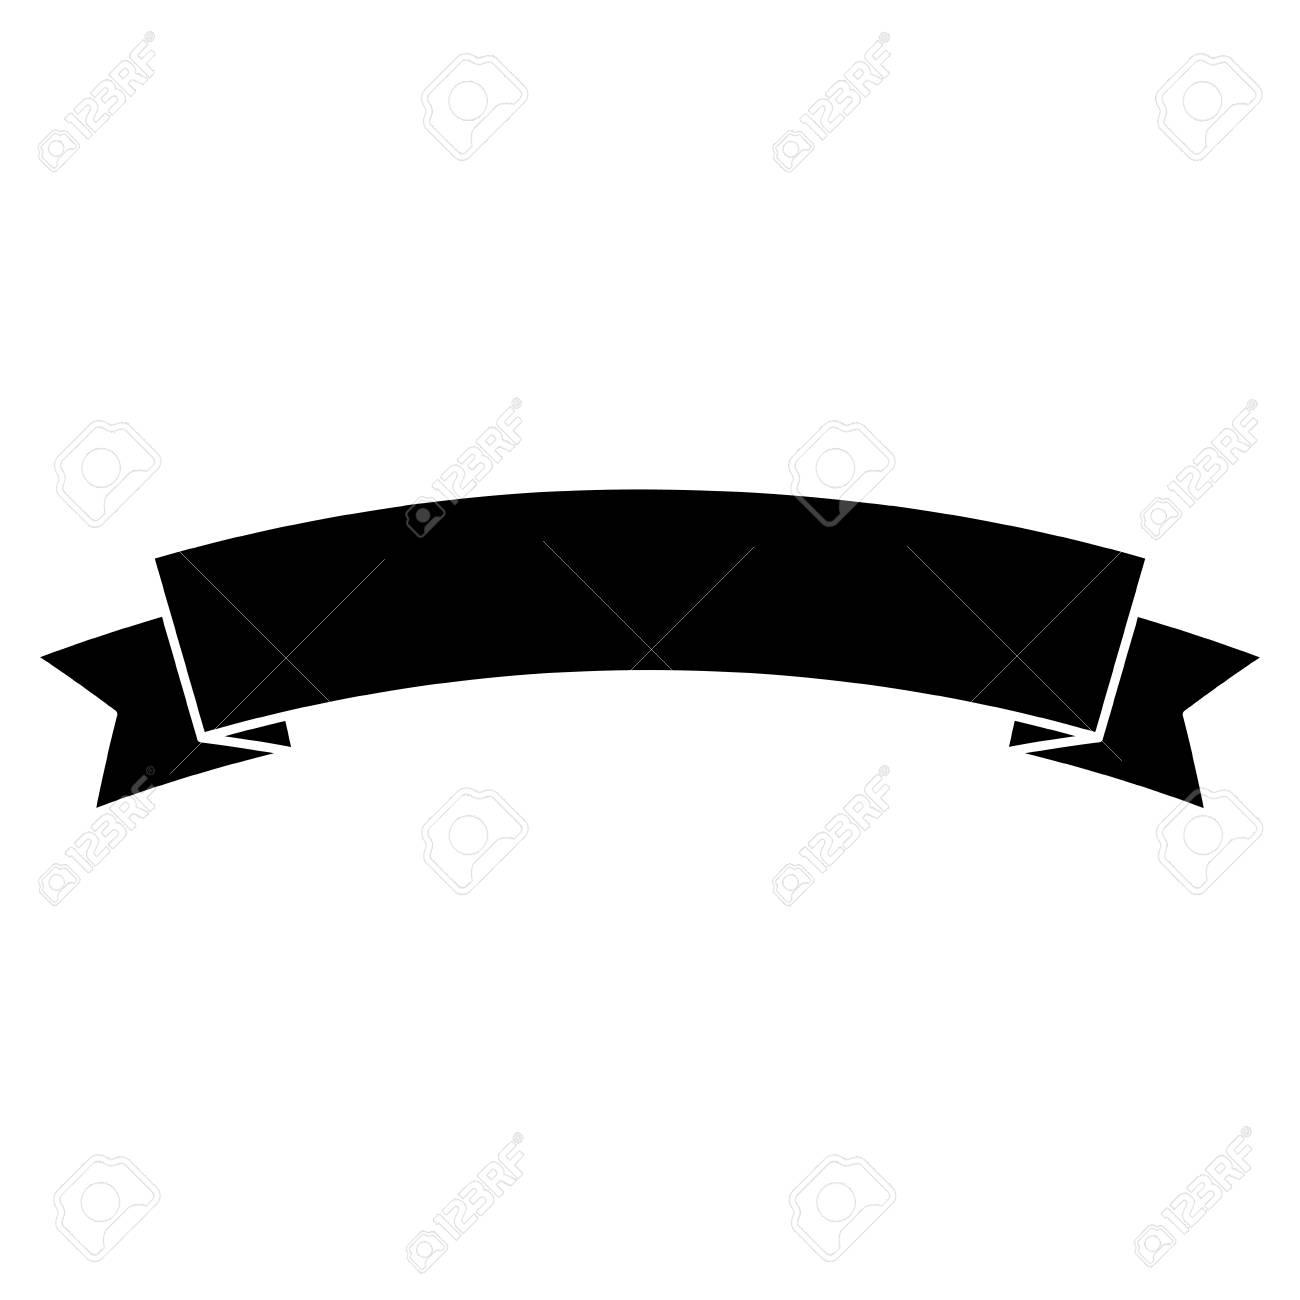 Ribbon banner icon image. Vector illustration design black and white. - 93448030